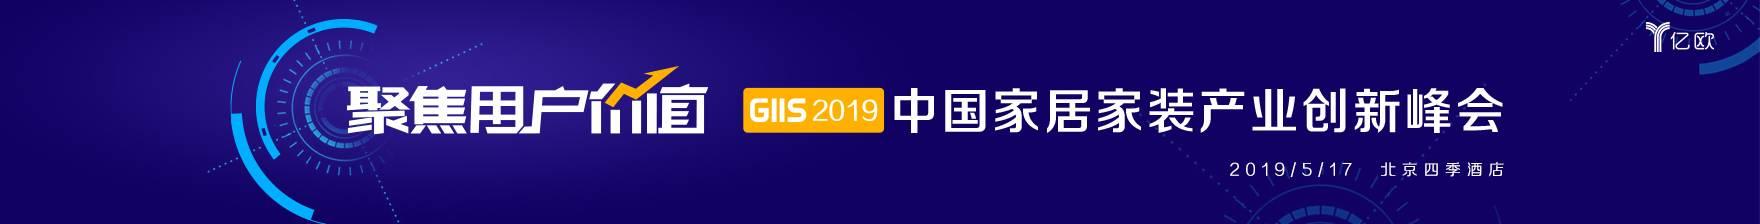 GIIS 2019中国家居家装产业创新峰会